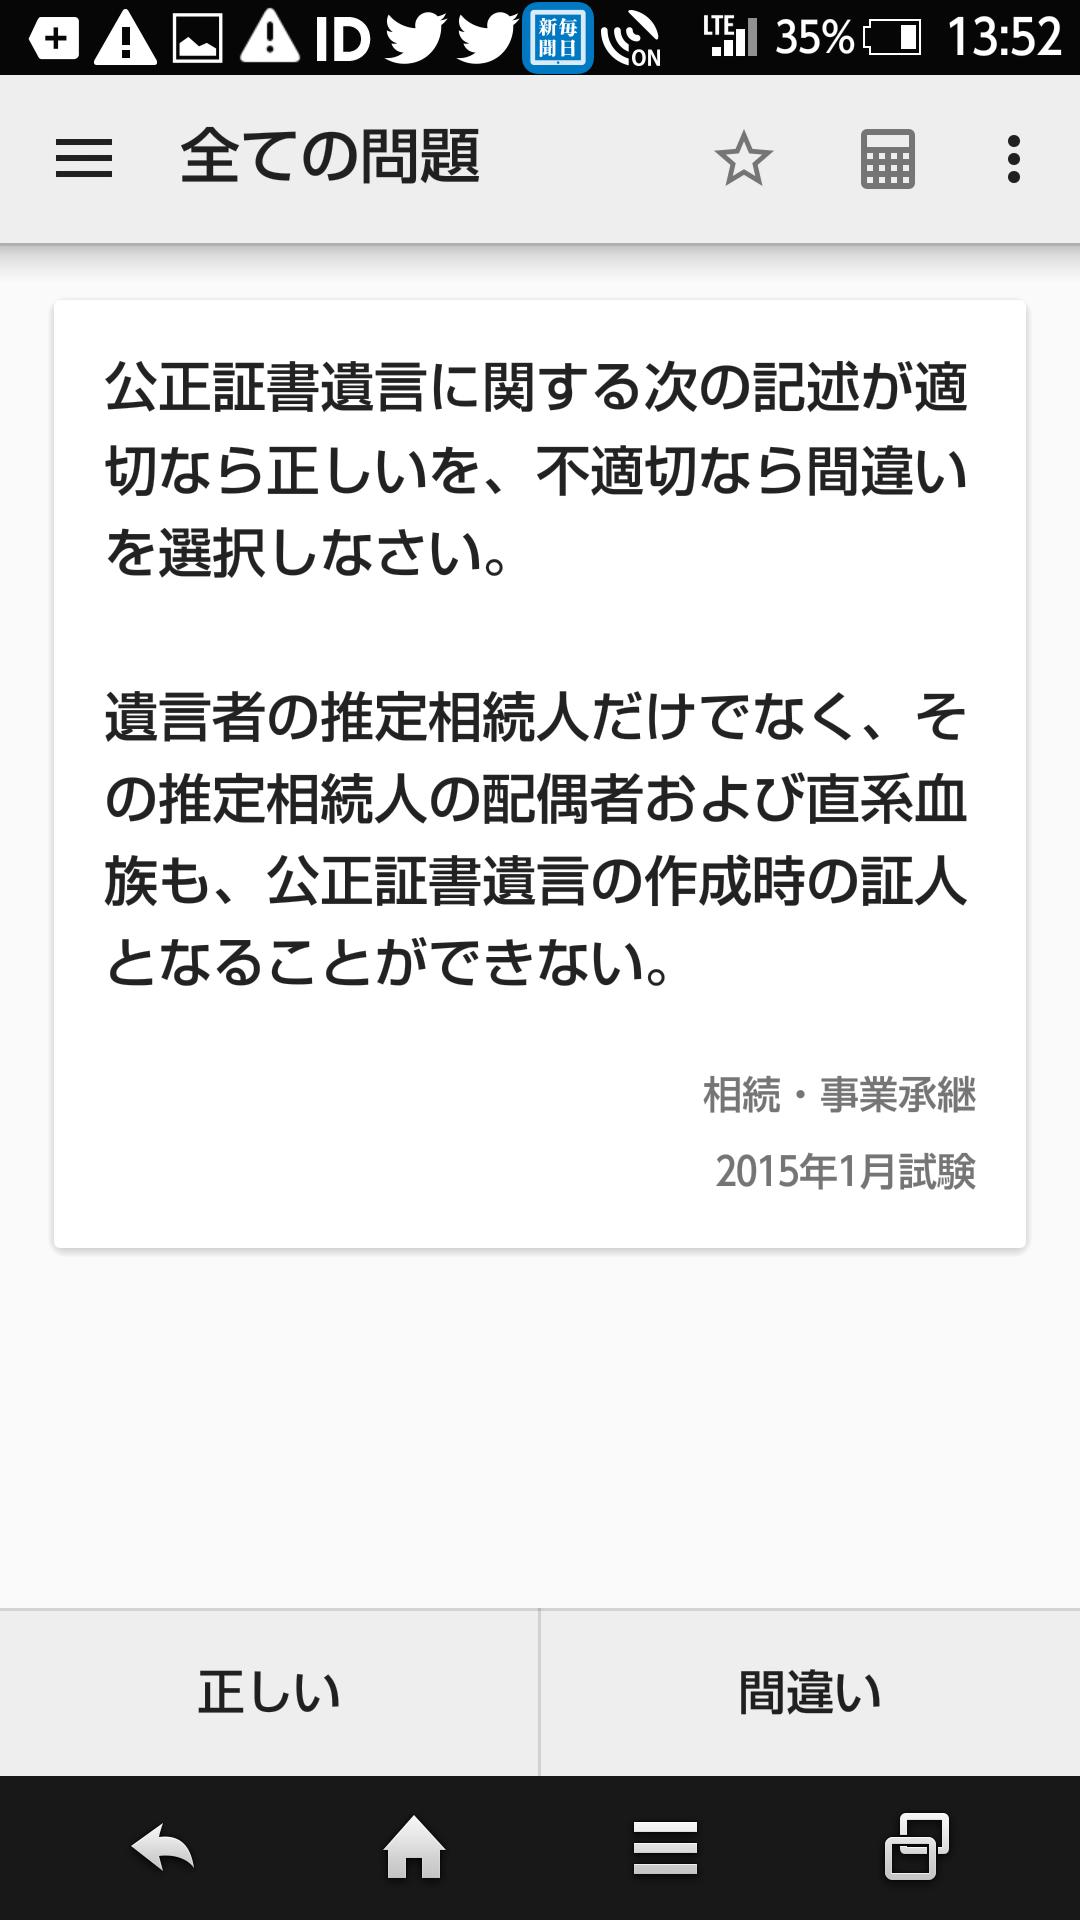 Screenshot_2016-07-09-13-52-59.png